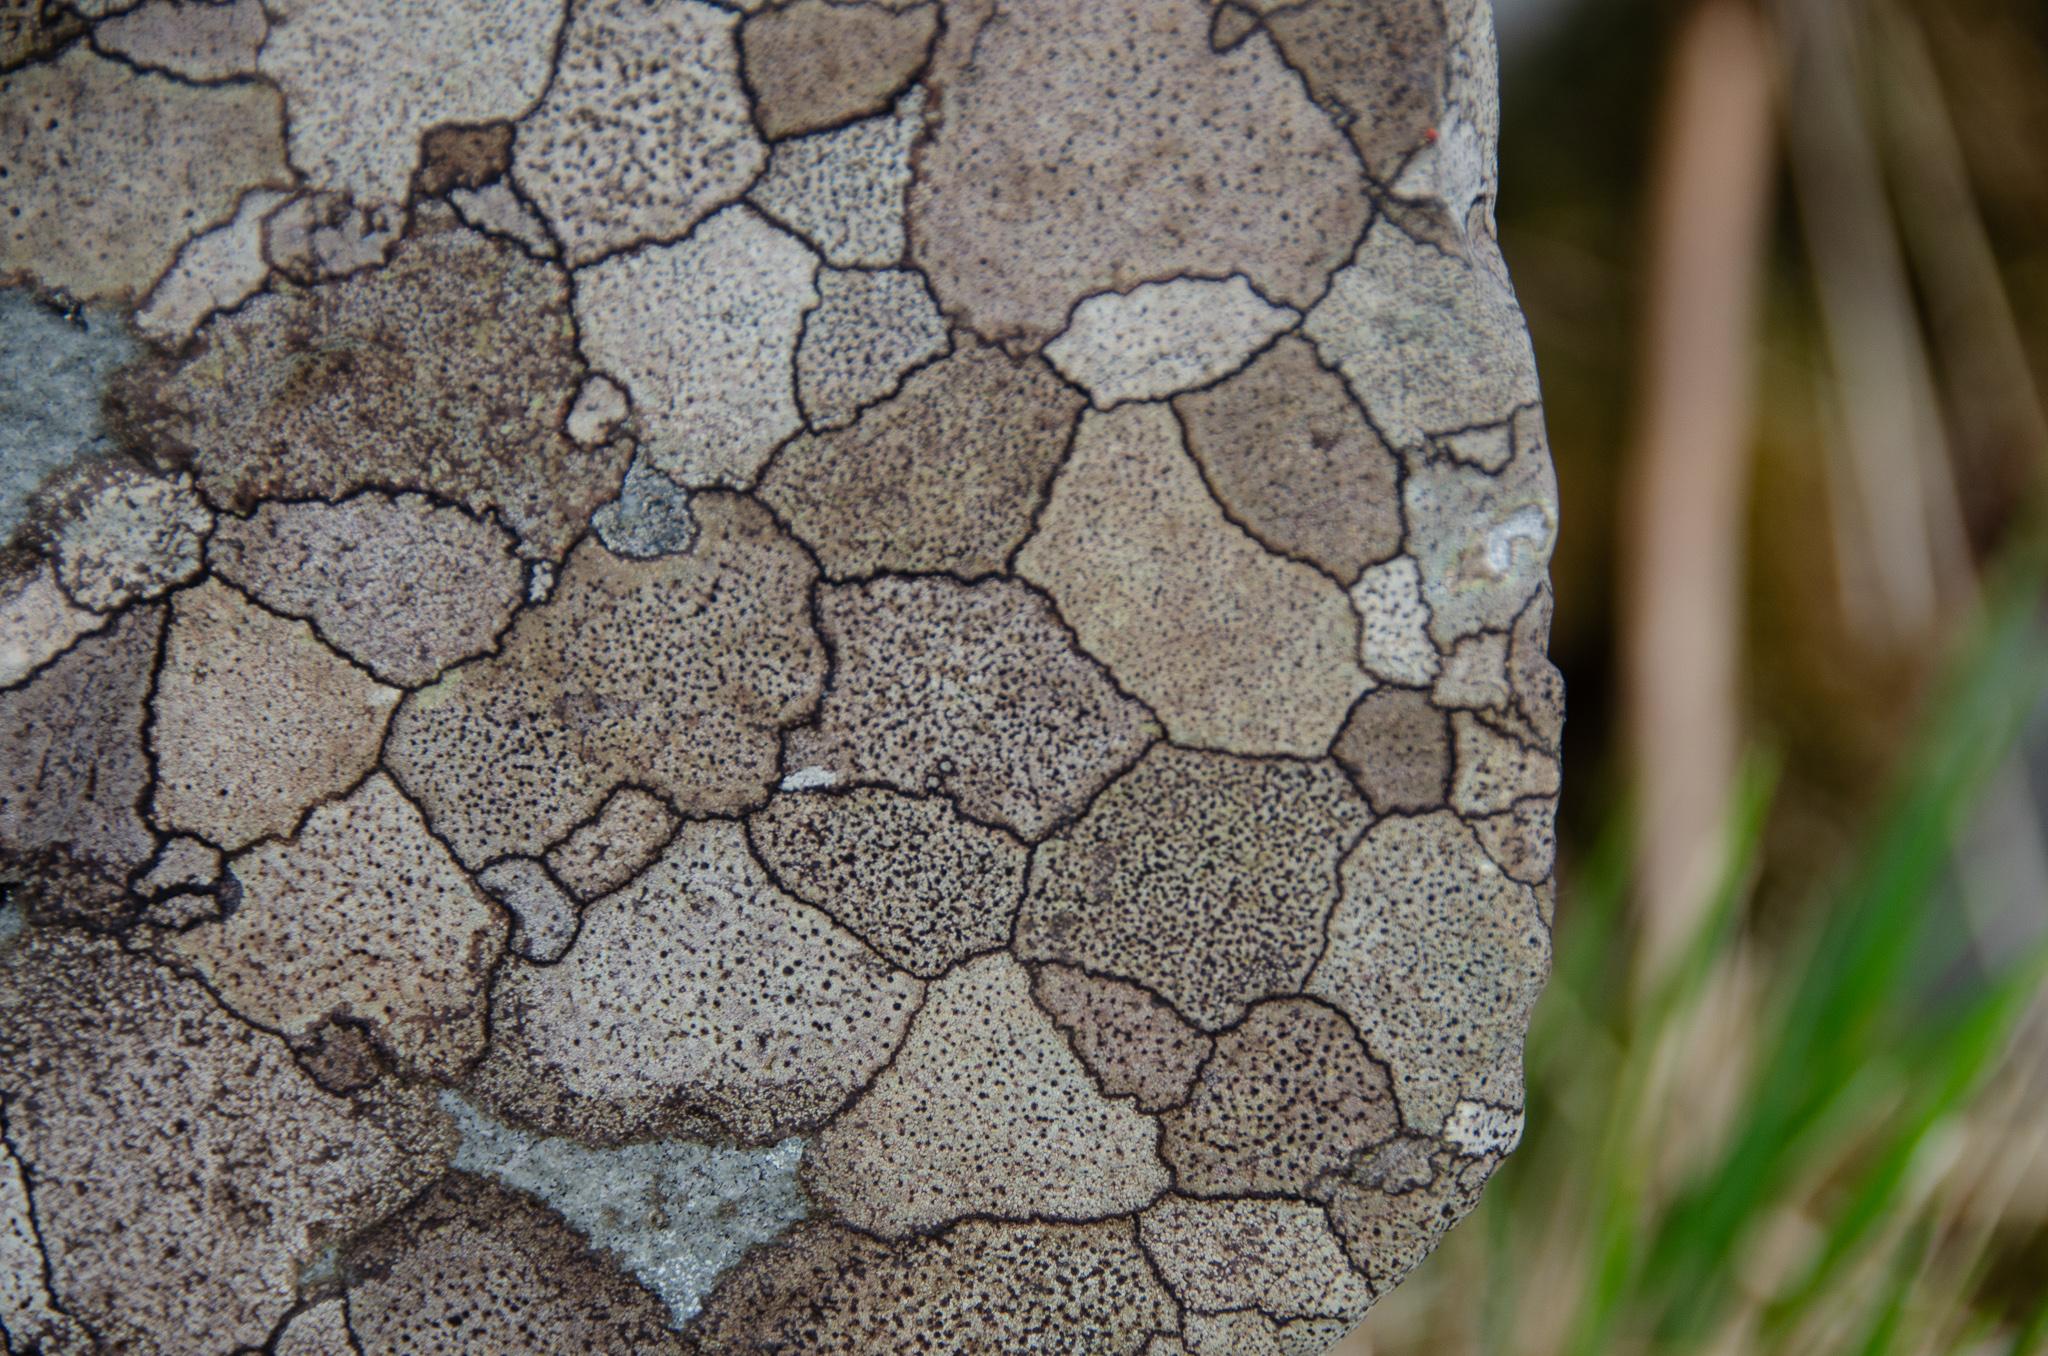 close-up- like a mosaic.